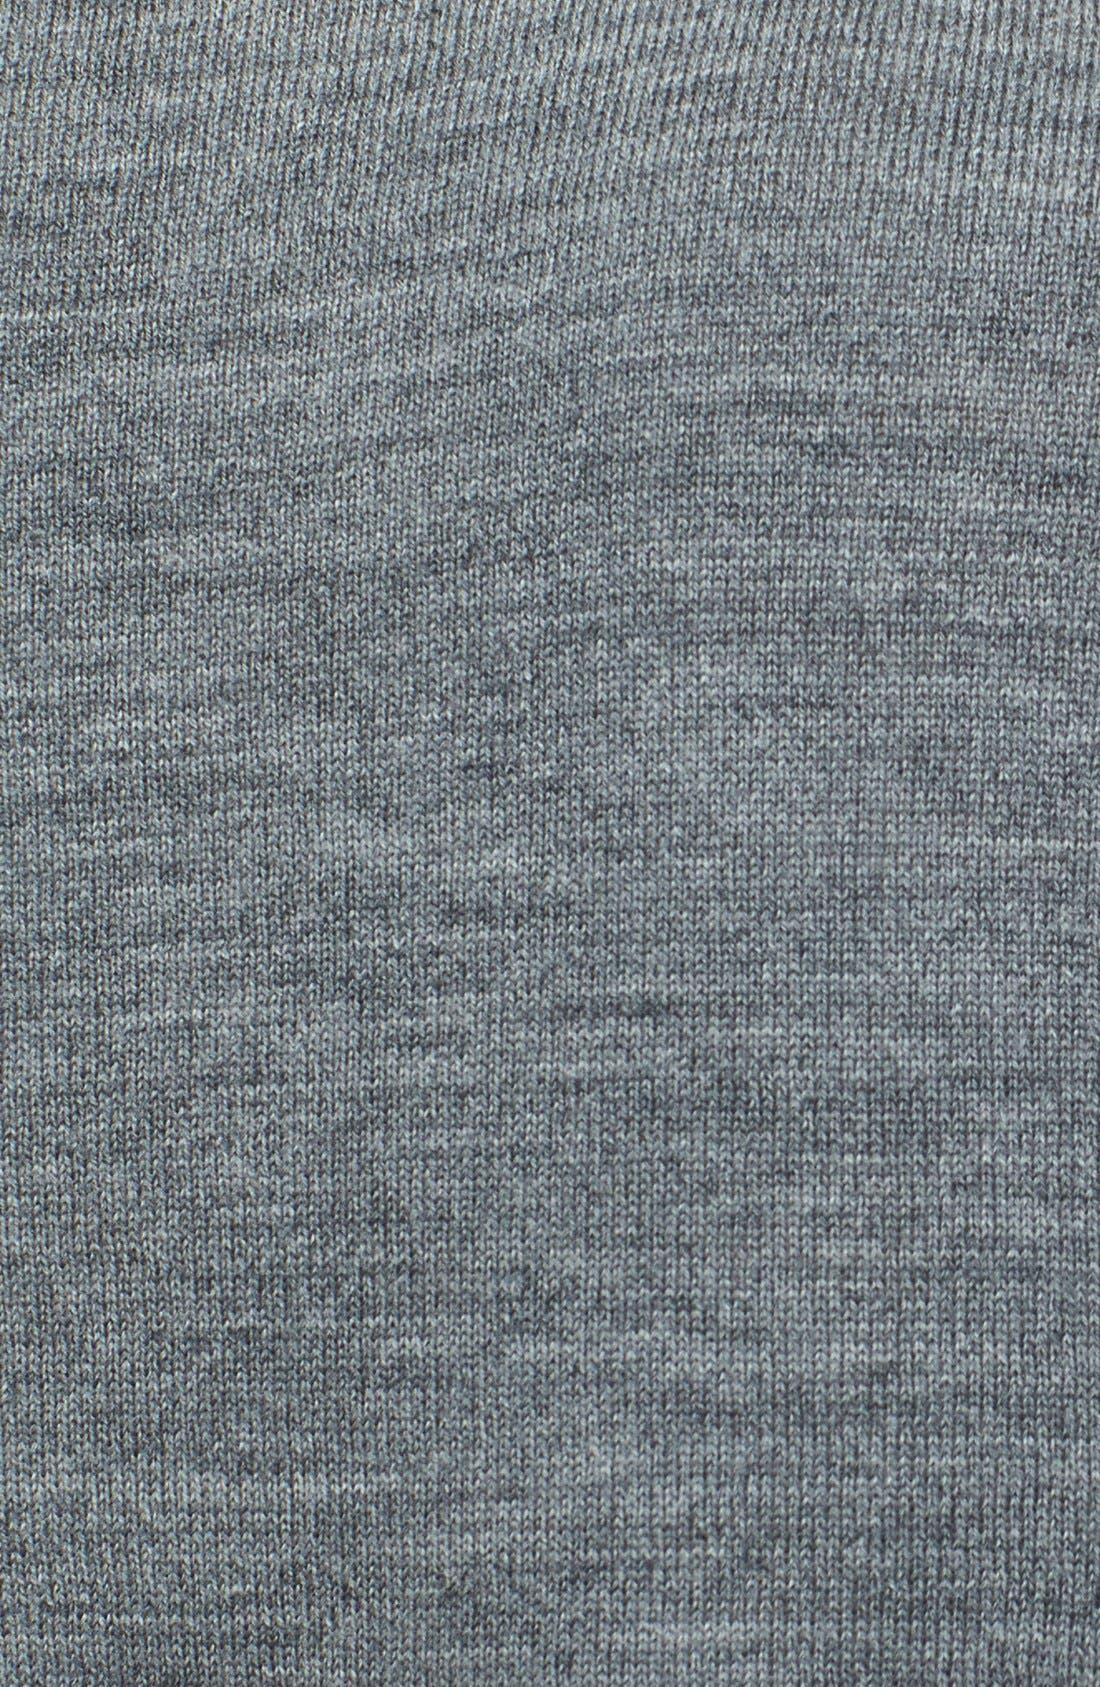 Alternate Image 3  - Burberry Prorsum Merino Wool Cardigan